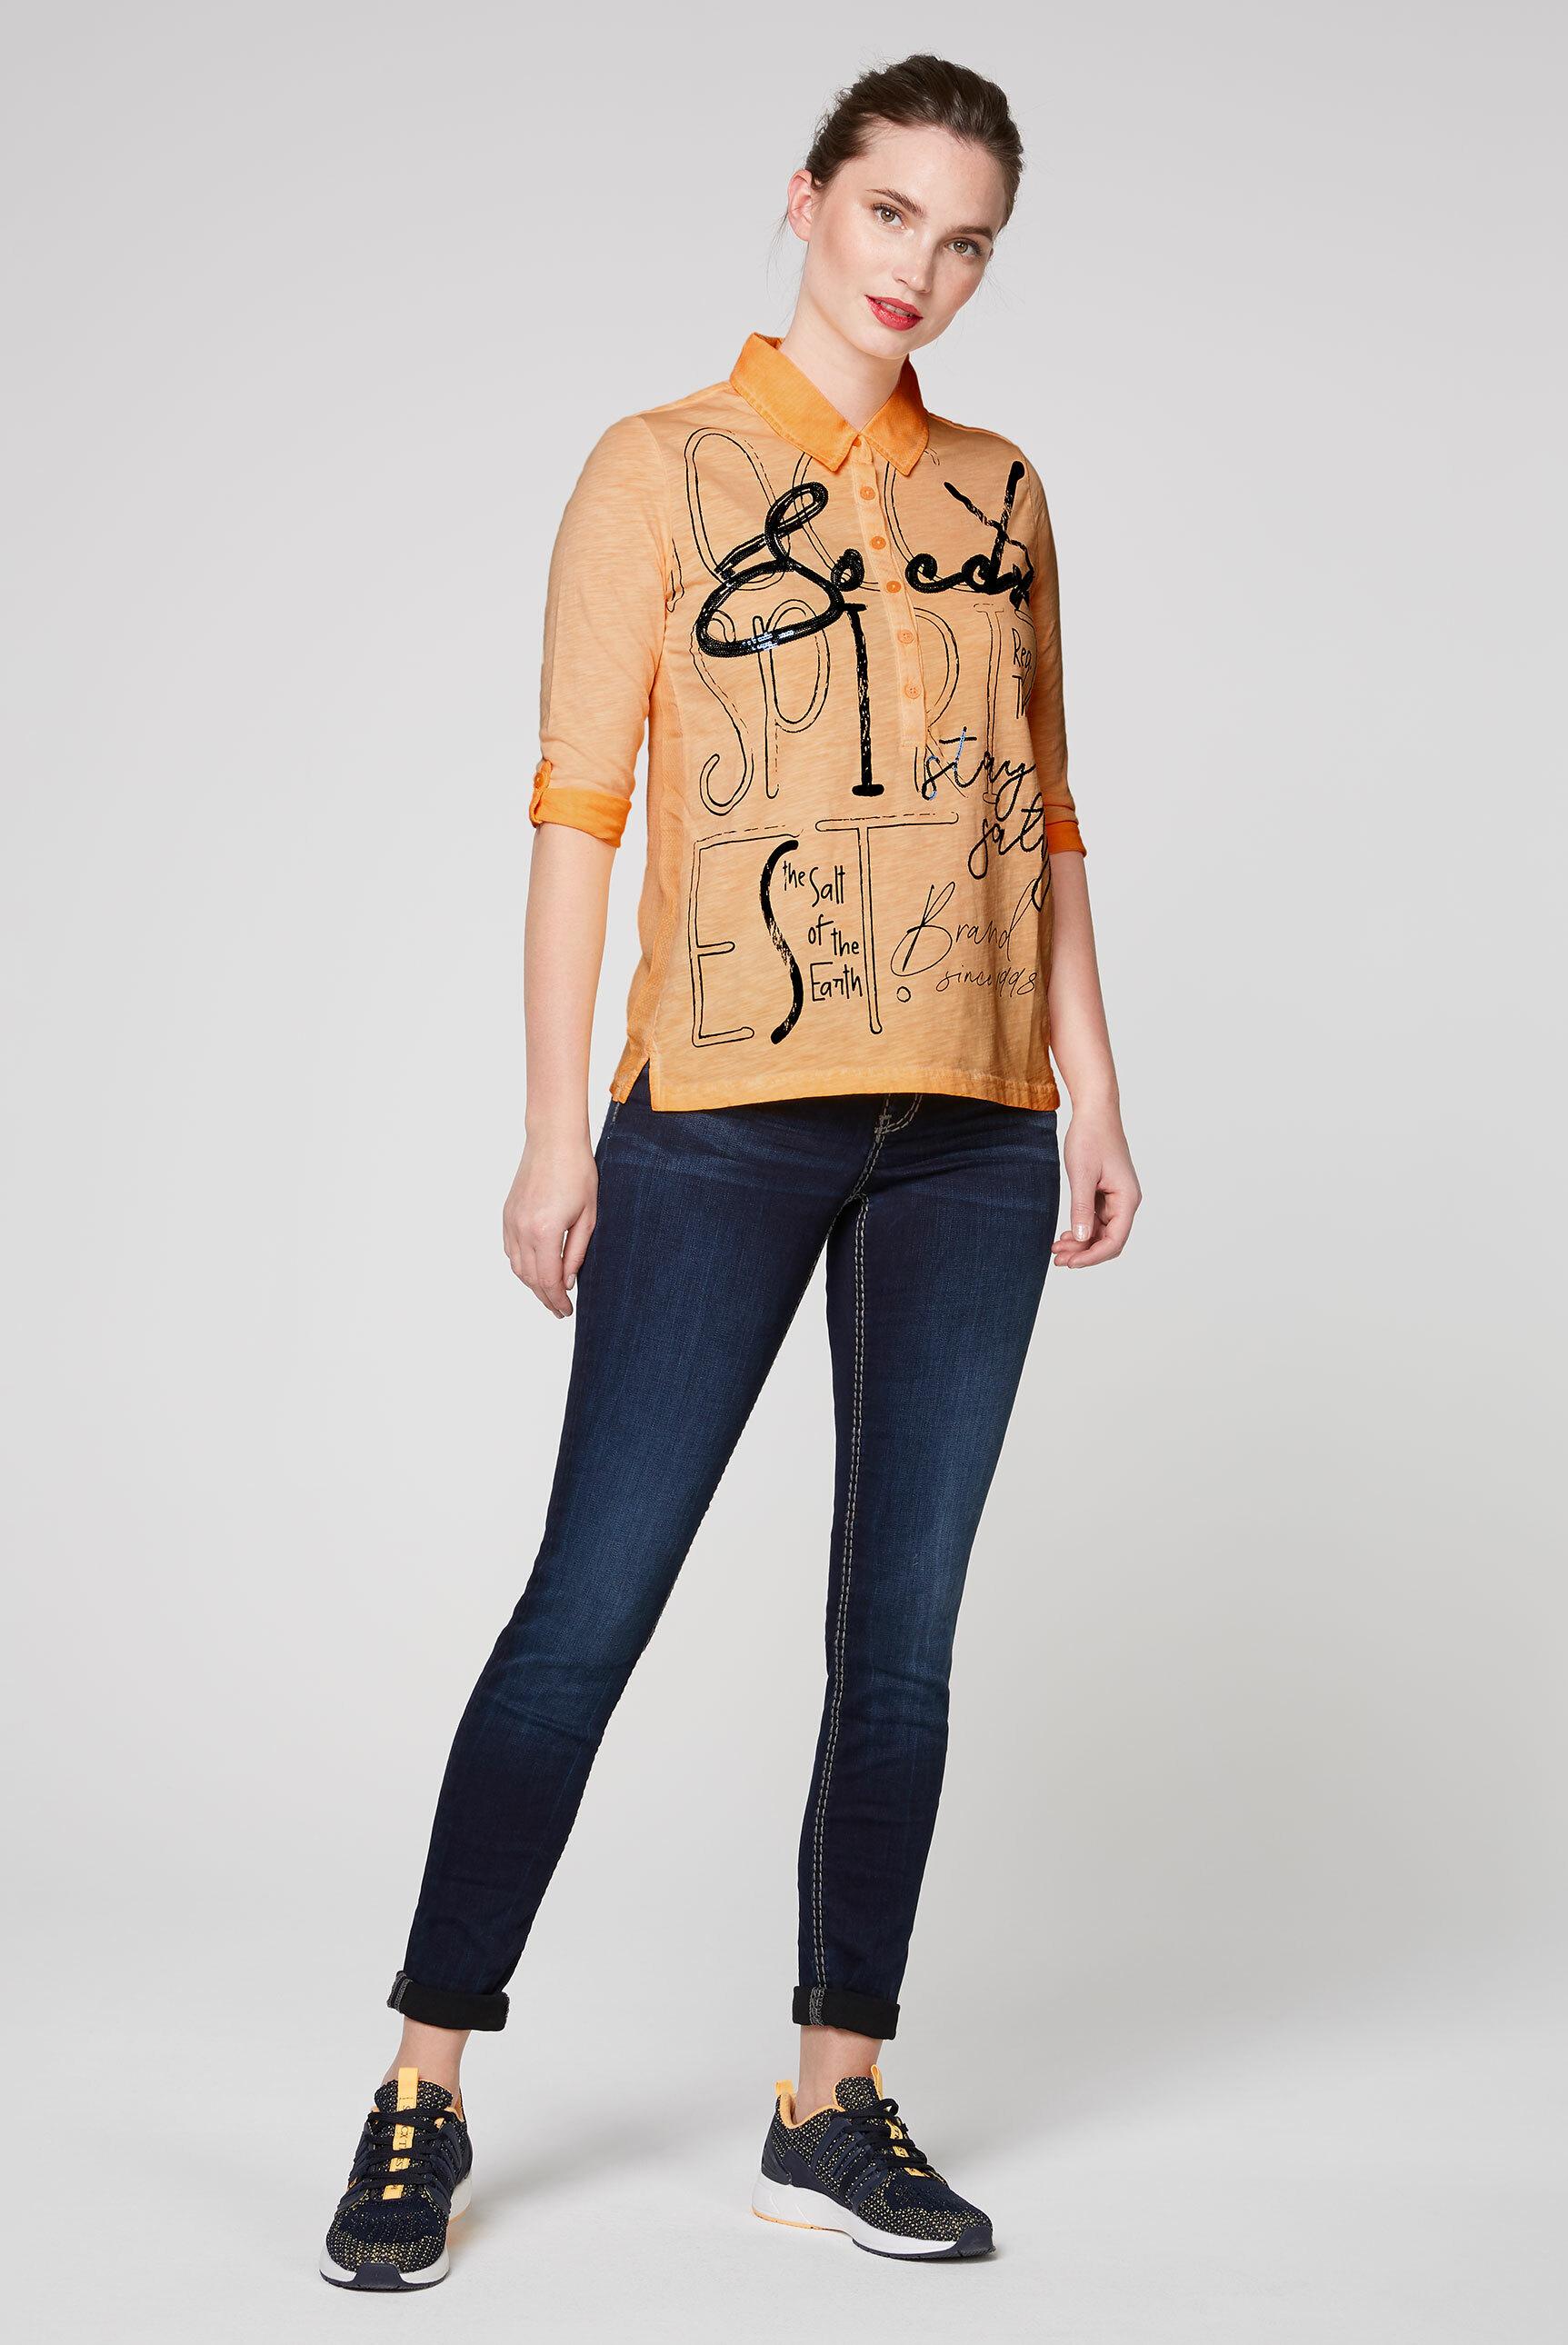 Poloshirt im Materialmix mit Pailletten-Artwork